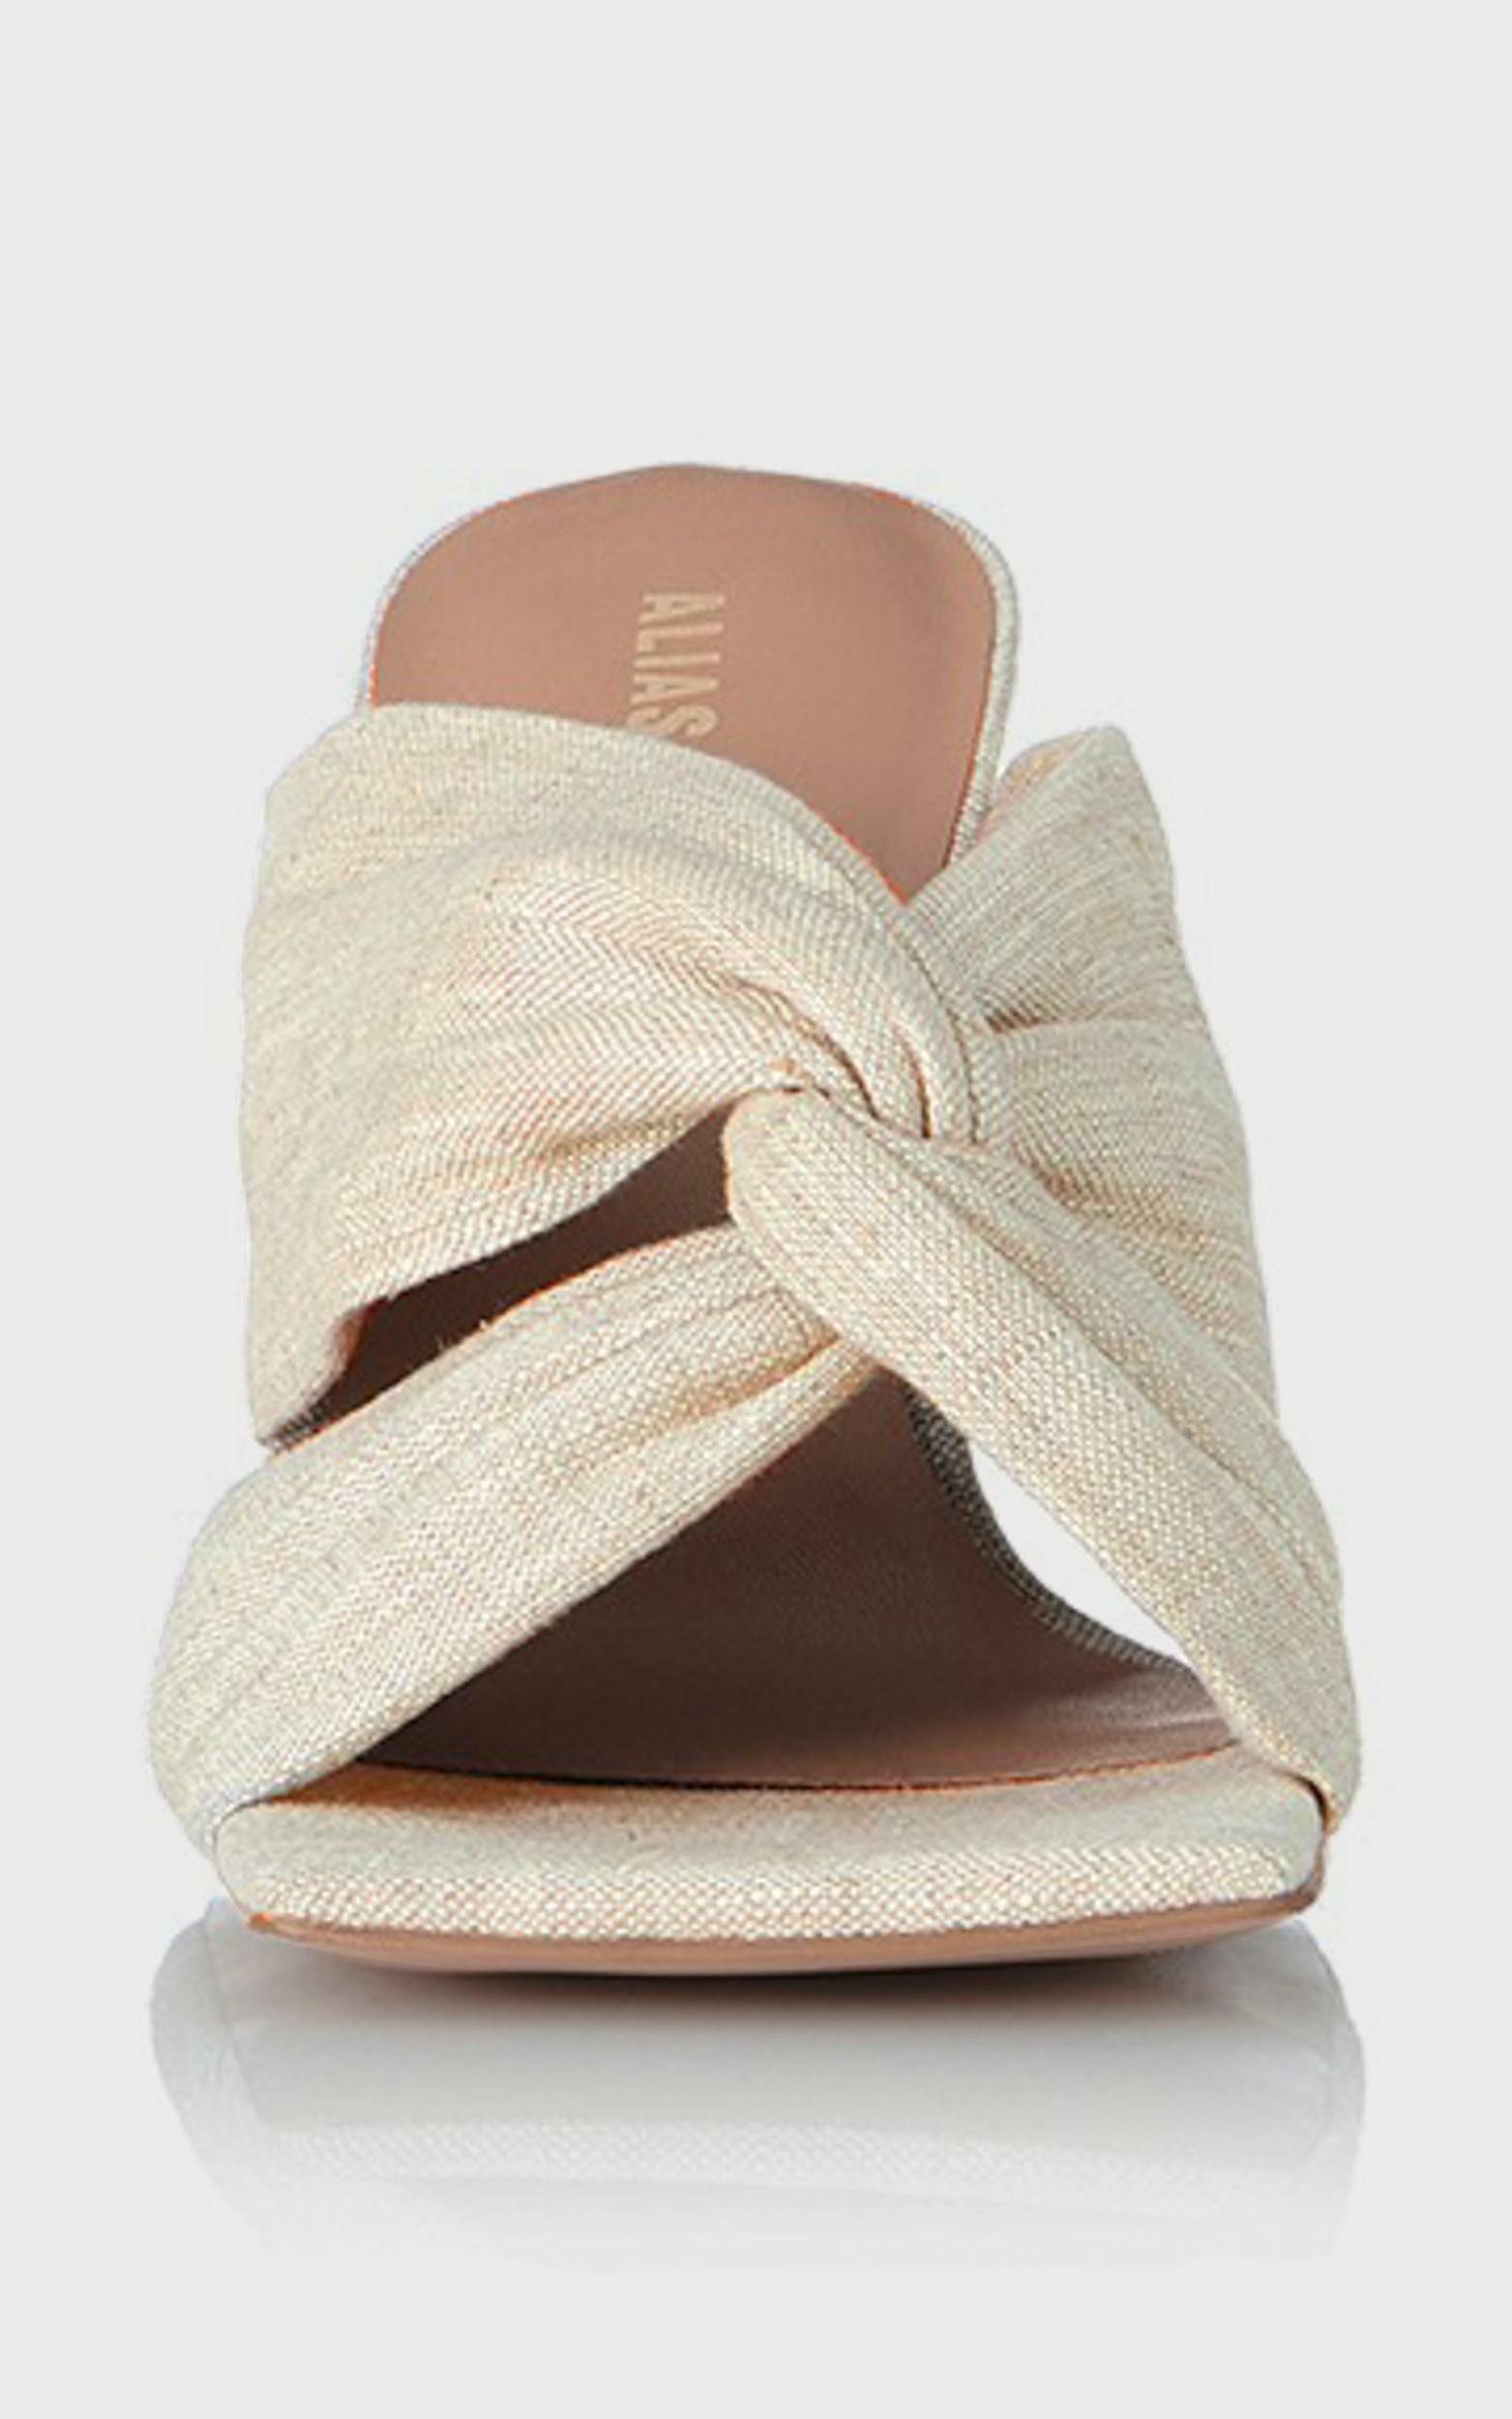 Alias Mae - Flo Heel in Natural Linen - 10.5, Beige, hi-res image number null